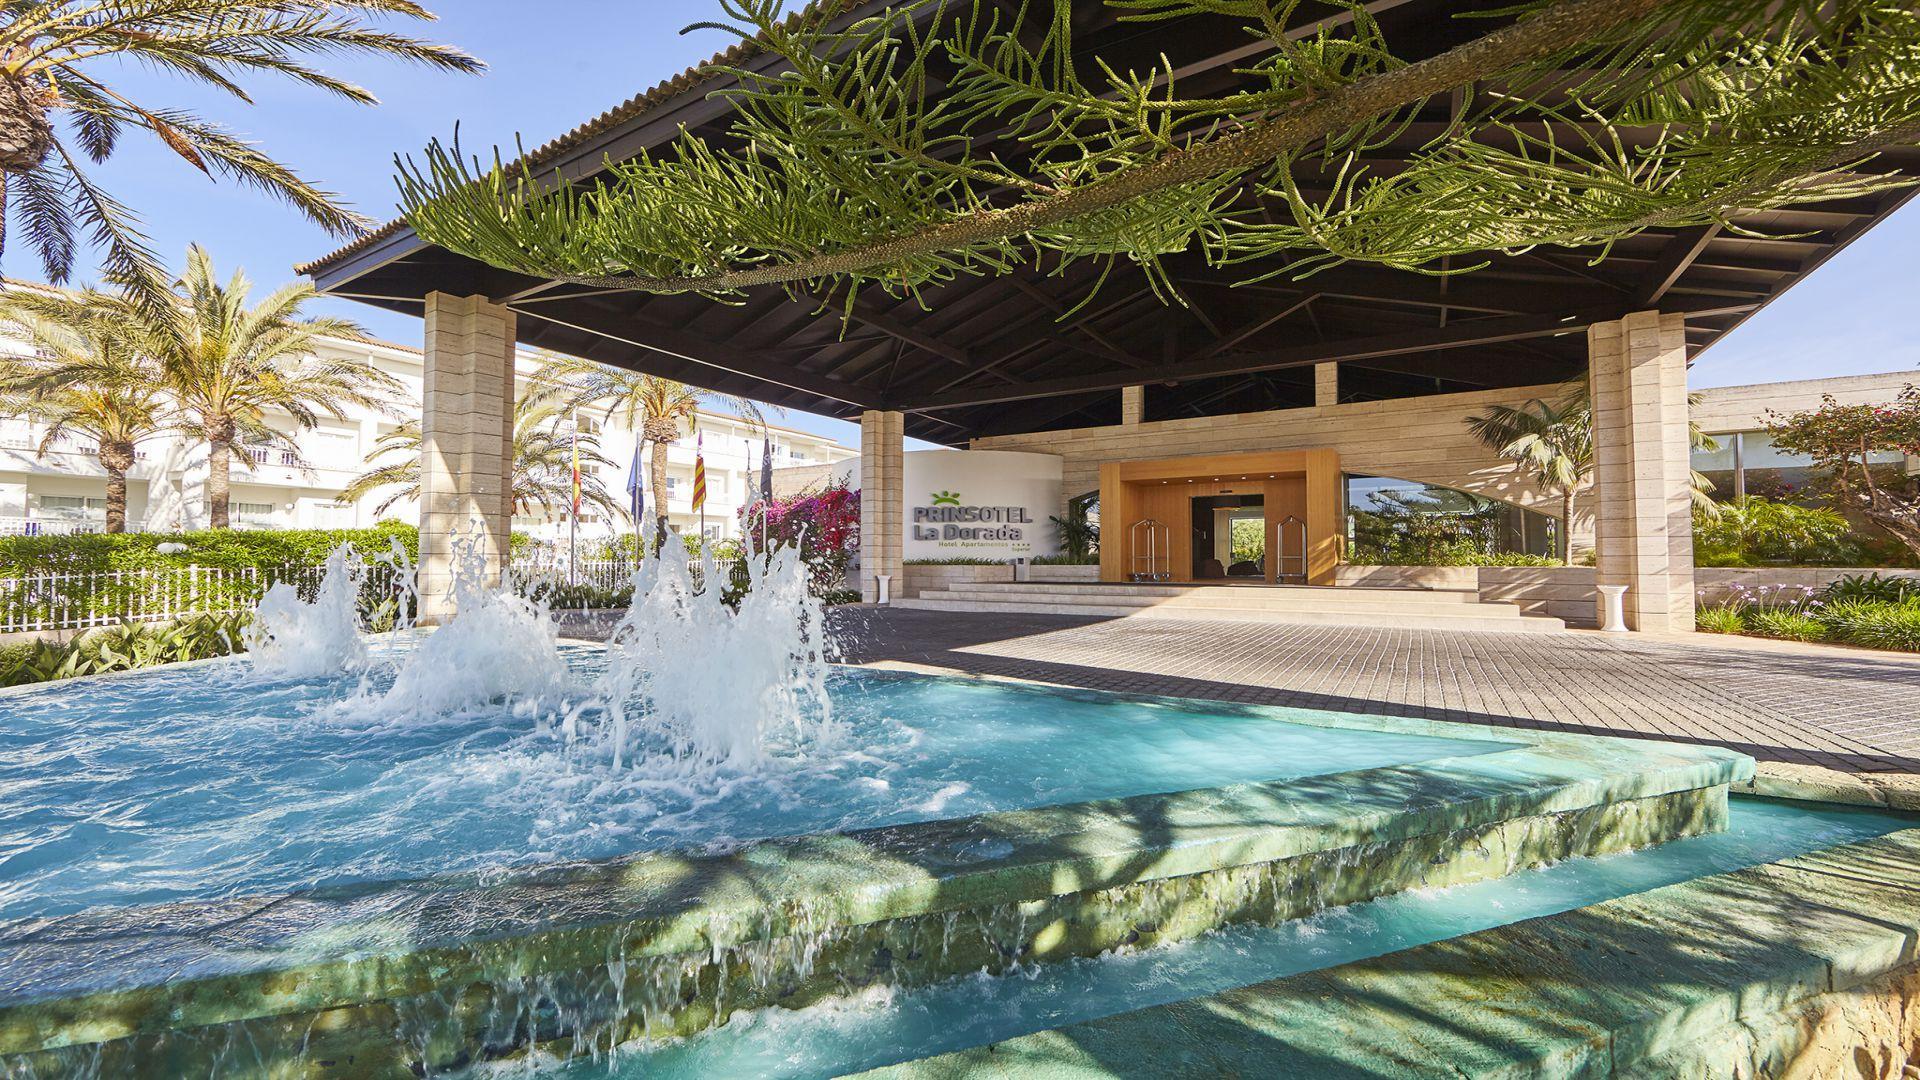 Hotel Dorada In Mallorca